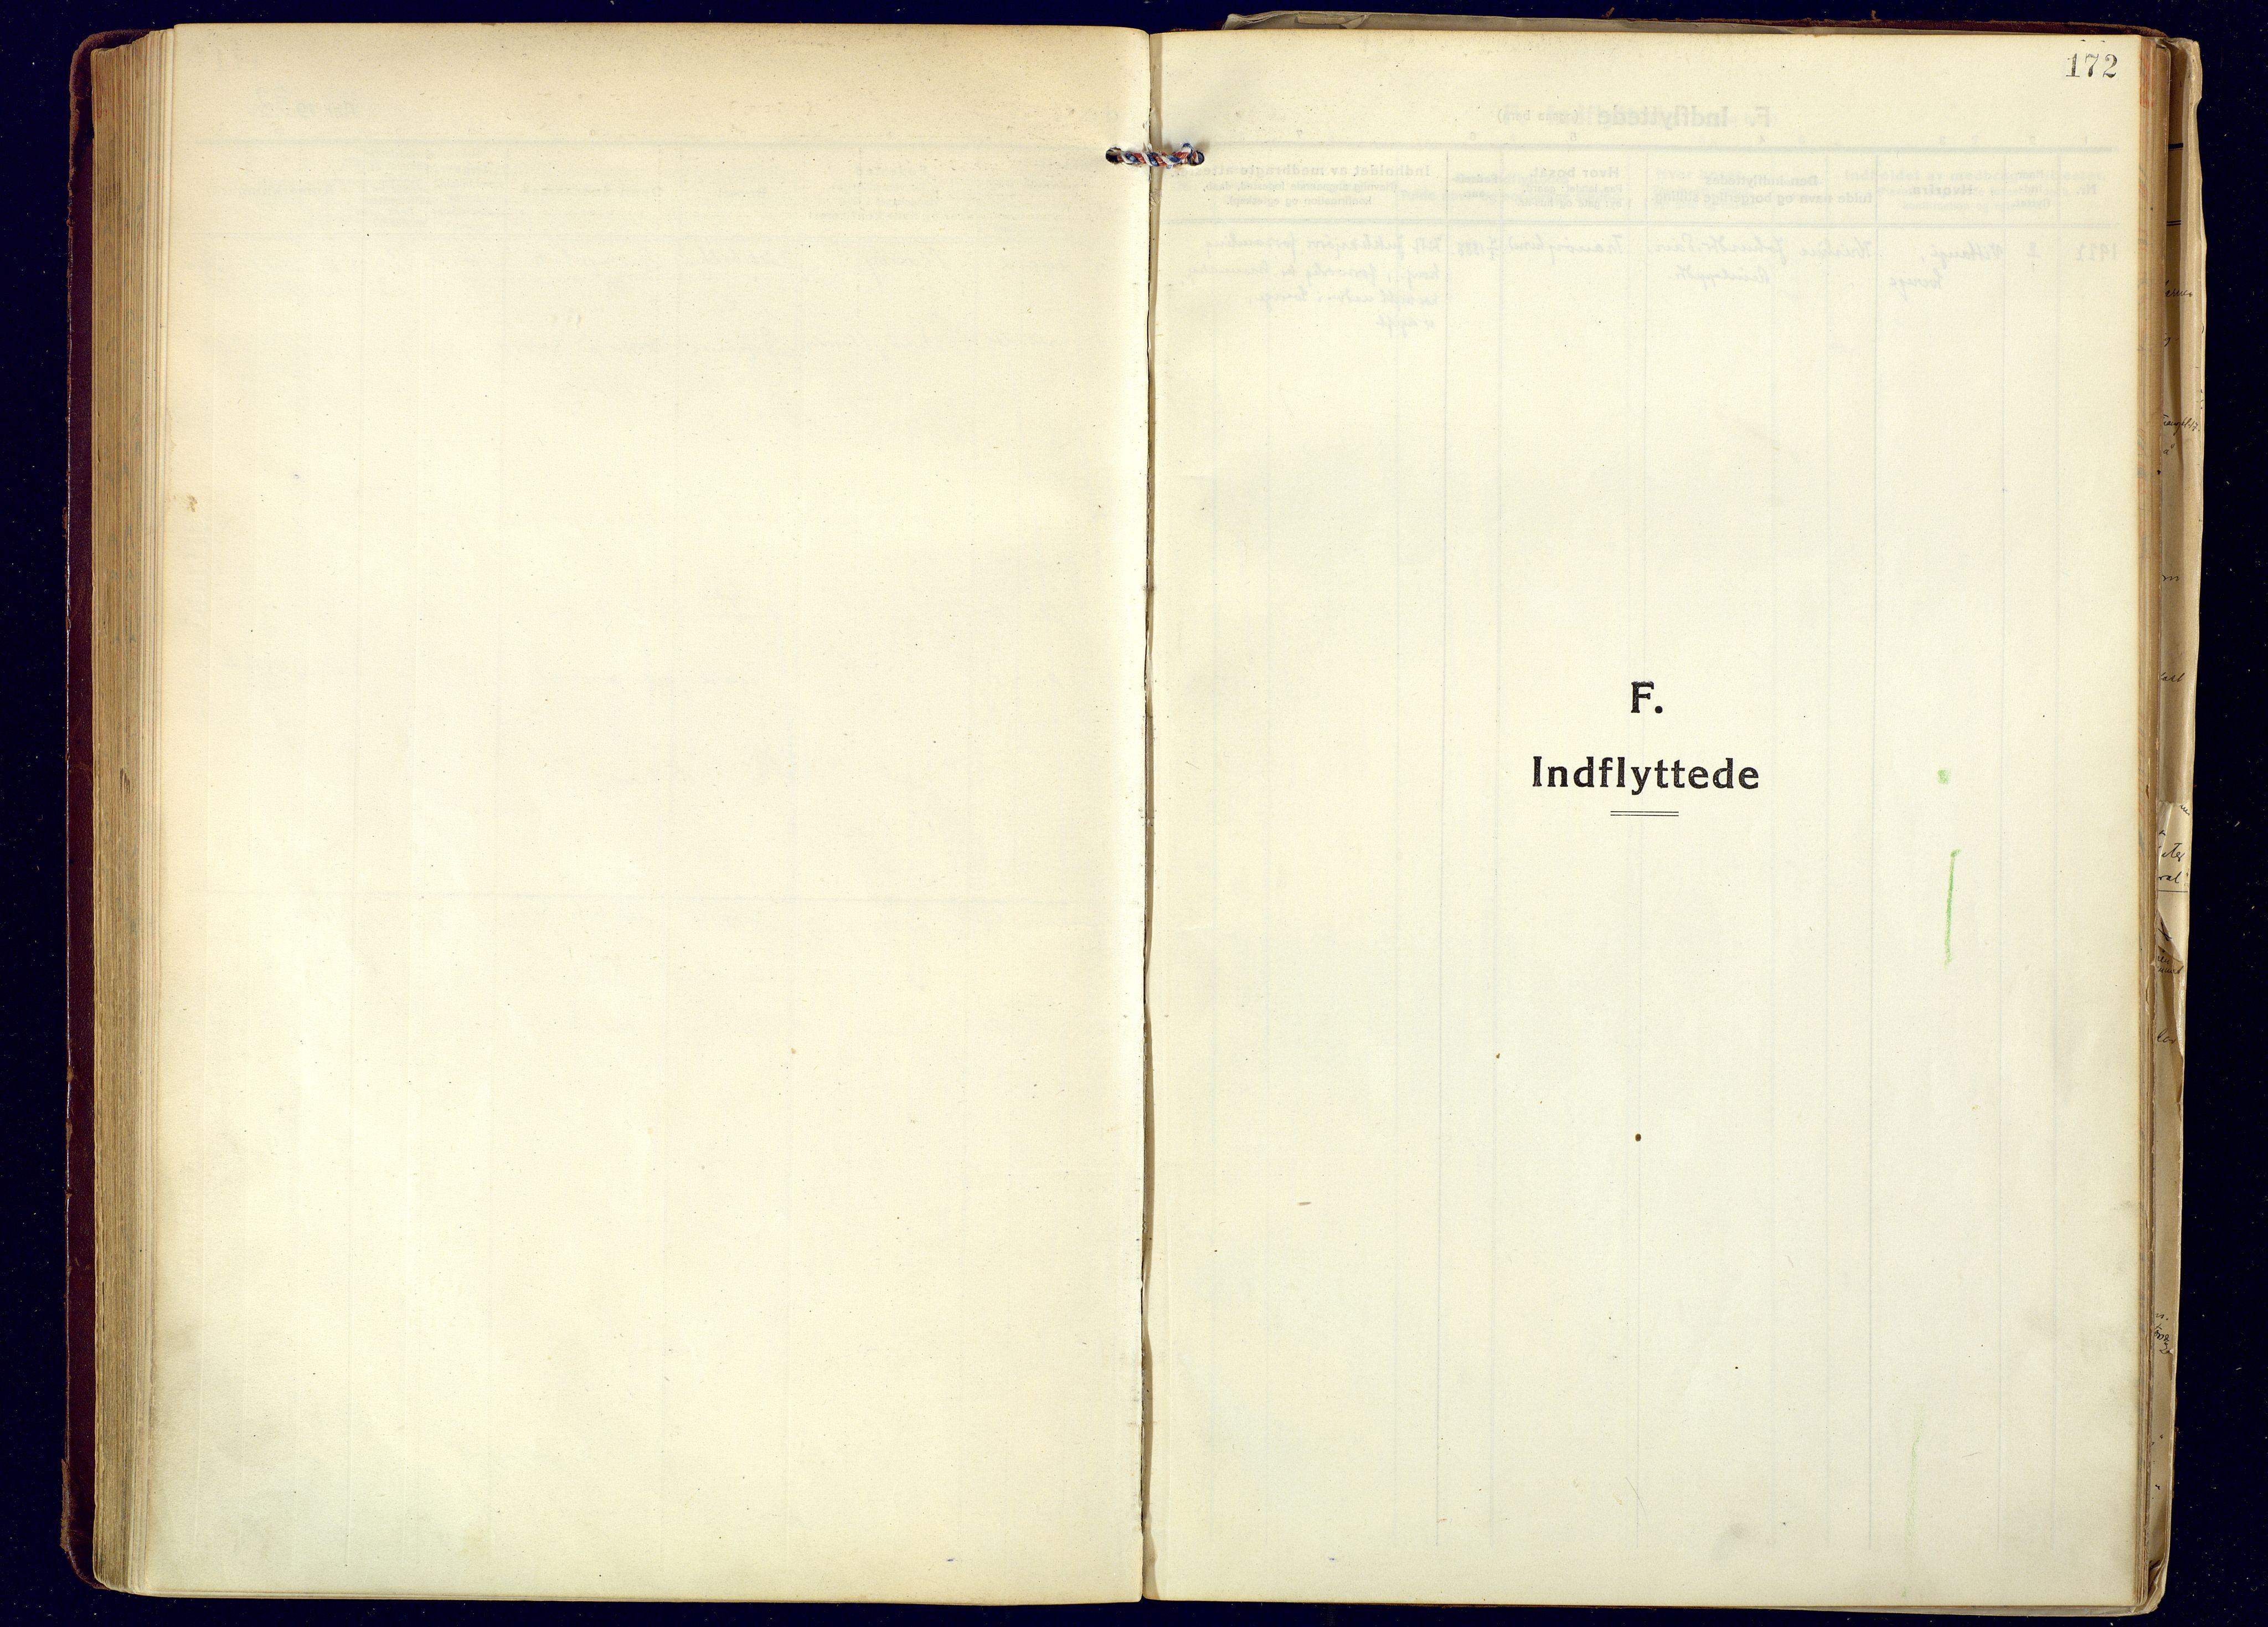 SATØ, Tranøy sokneprestkontor, I/Ia/Iaa: Ministerialbok nr. 16, 1919-1932, s. 172